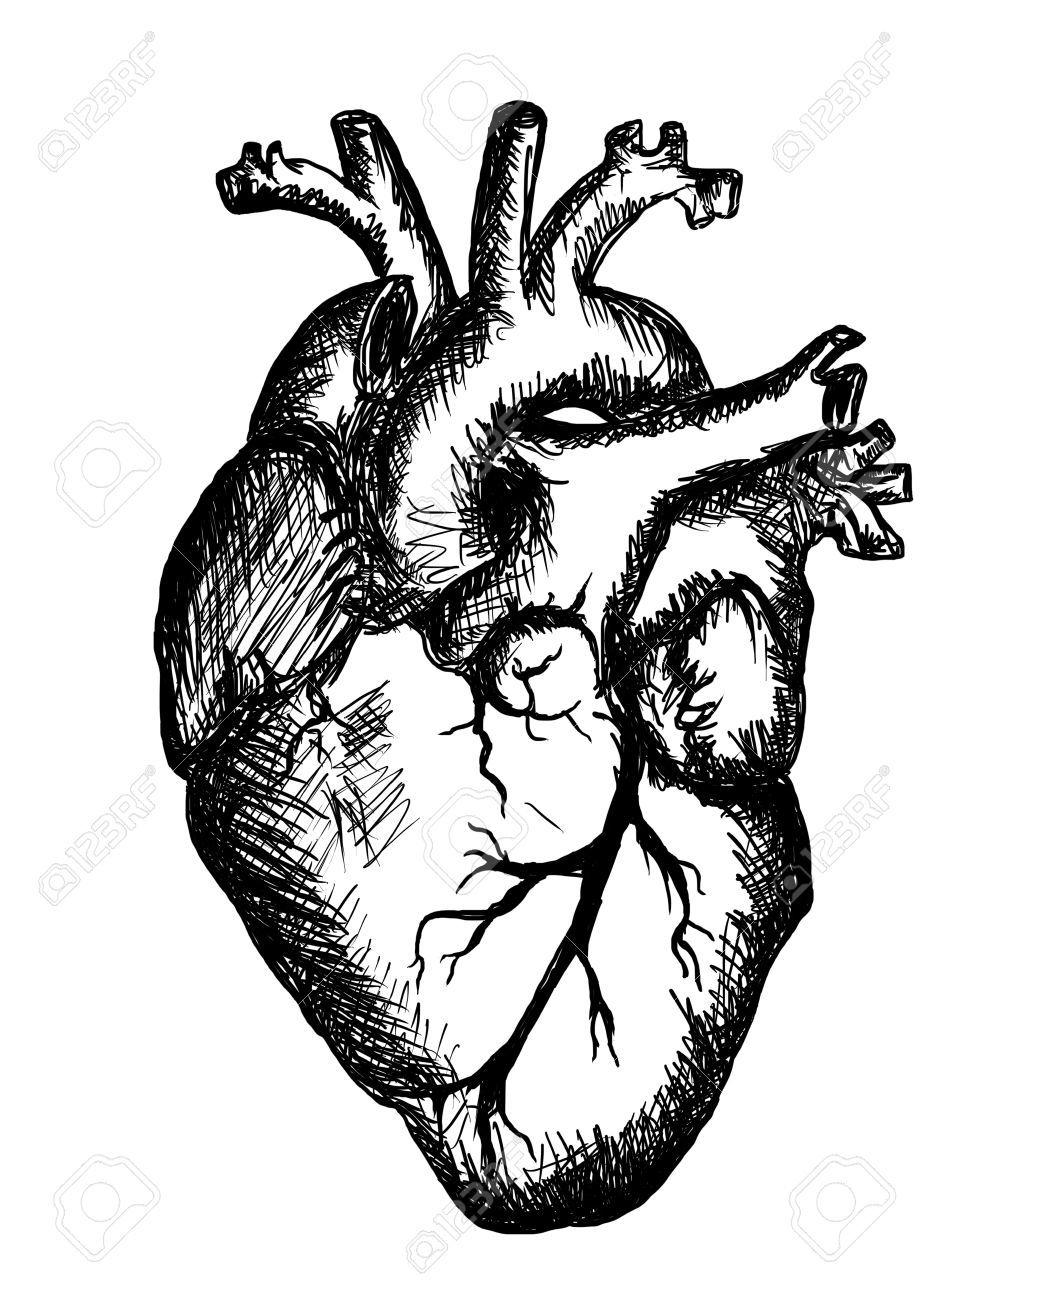 1044x1300 Human Heart Drawing Pic Human